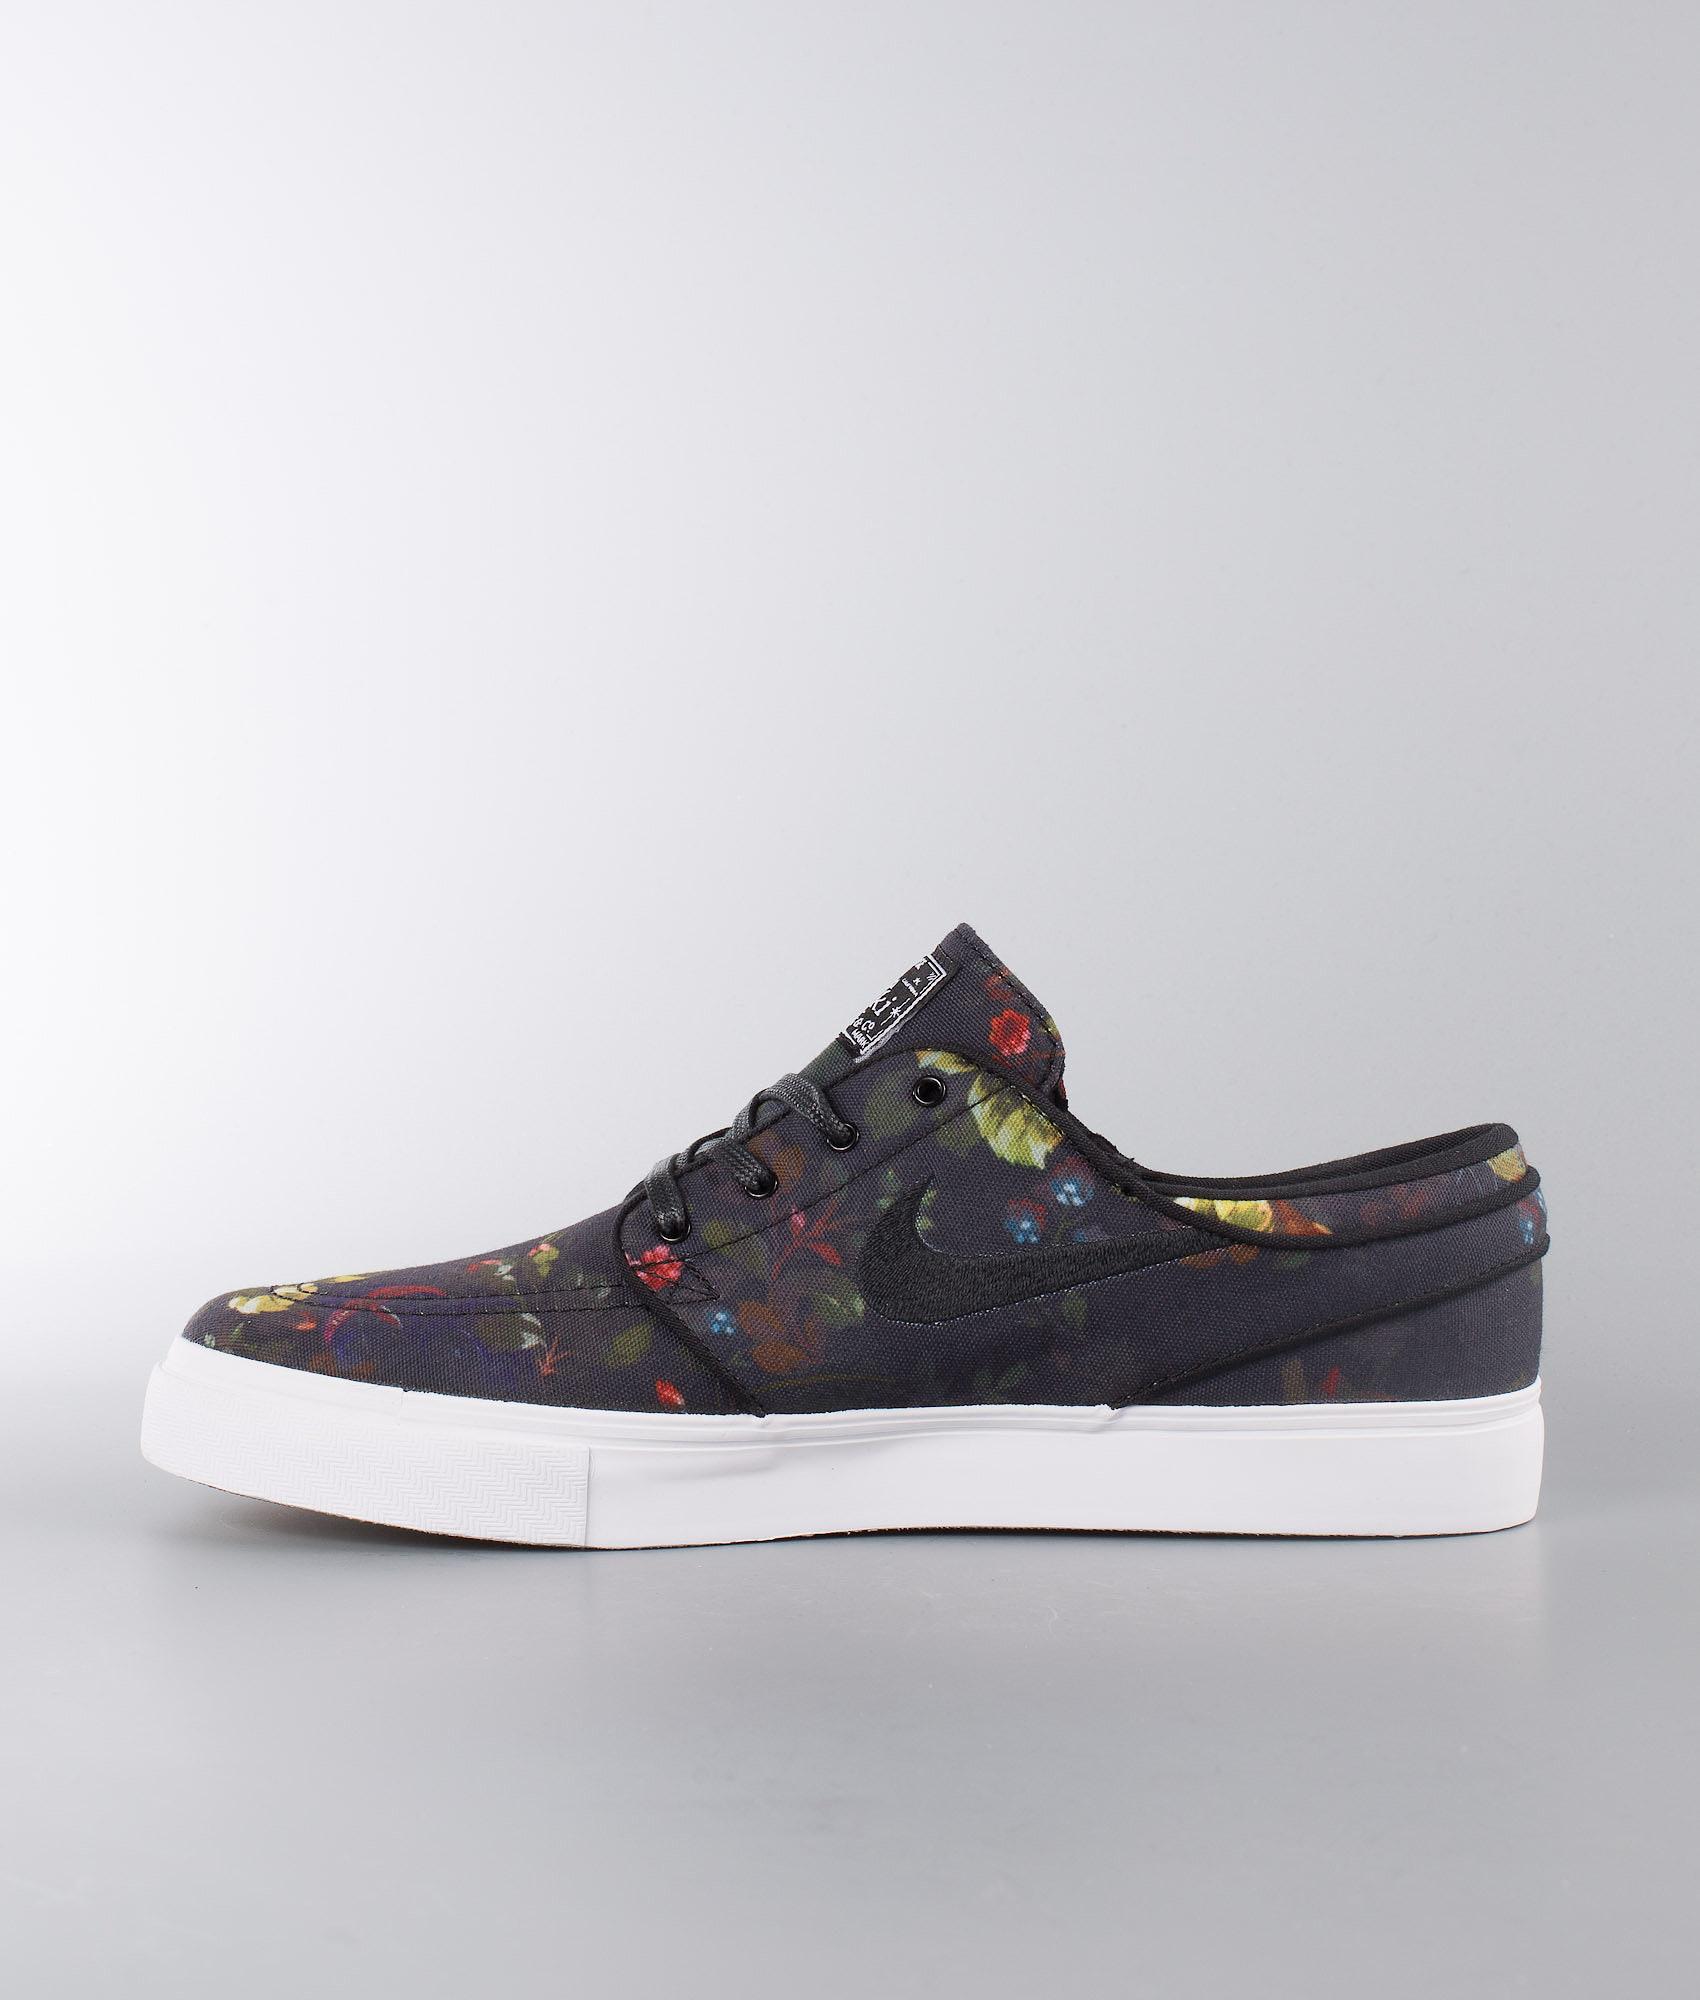 size 40 5105a add4e Nike Zoom Stefan Janoski Cnvs Shoes